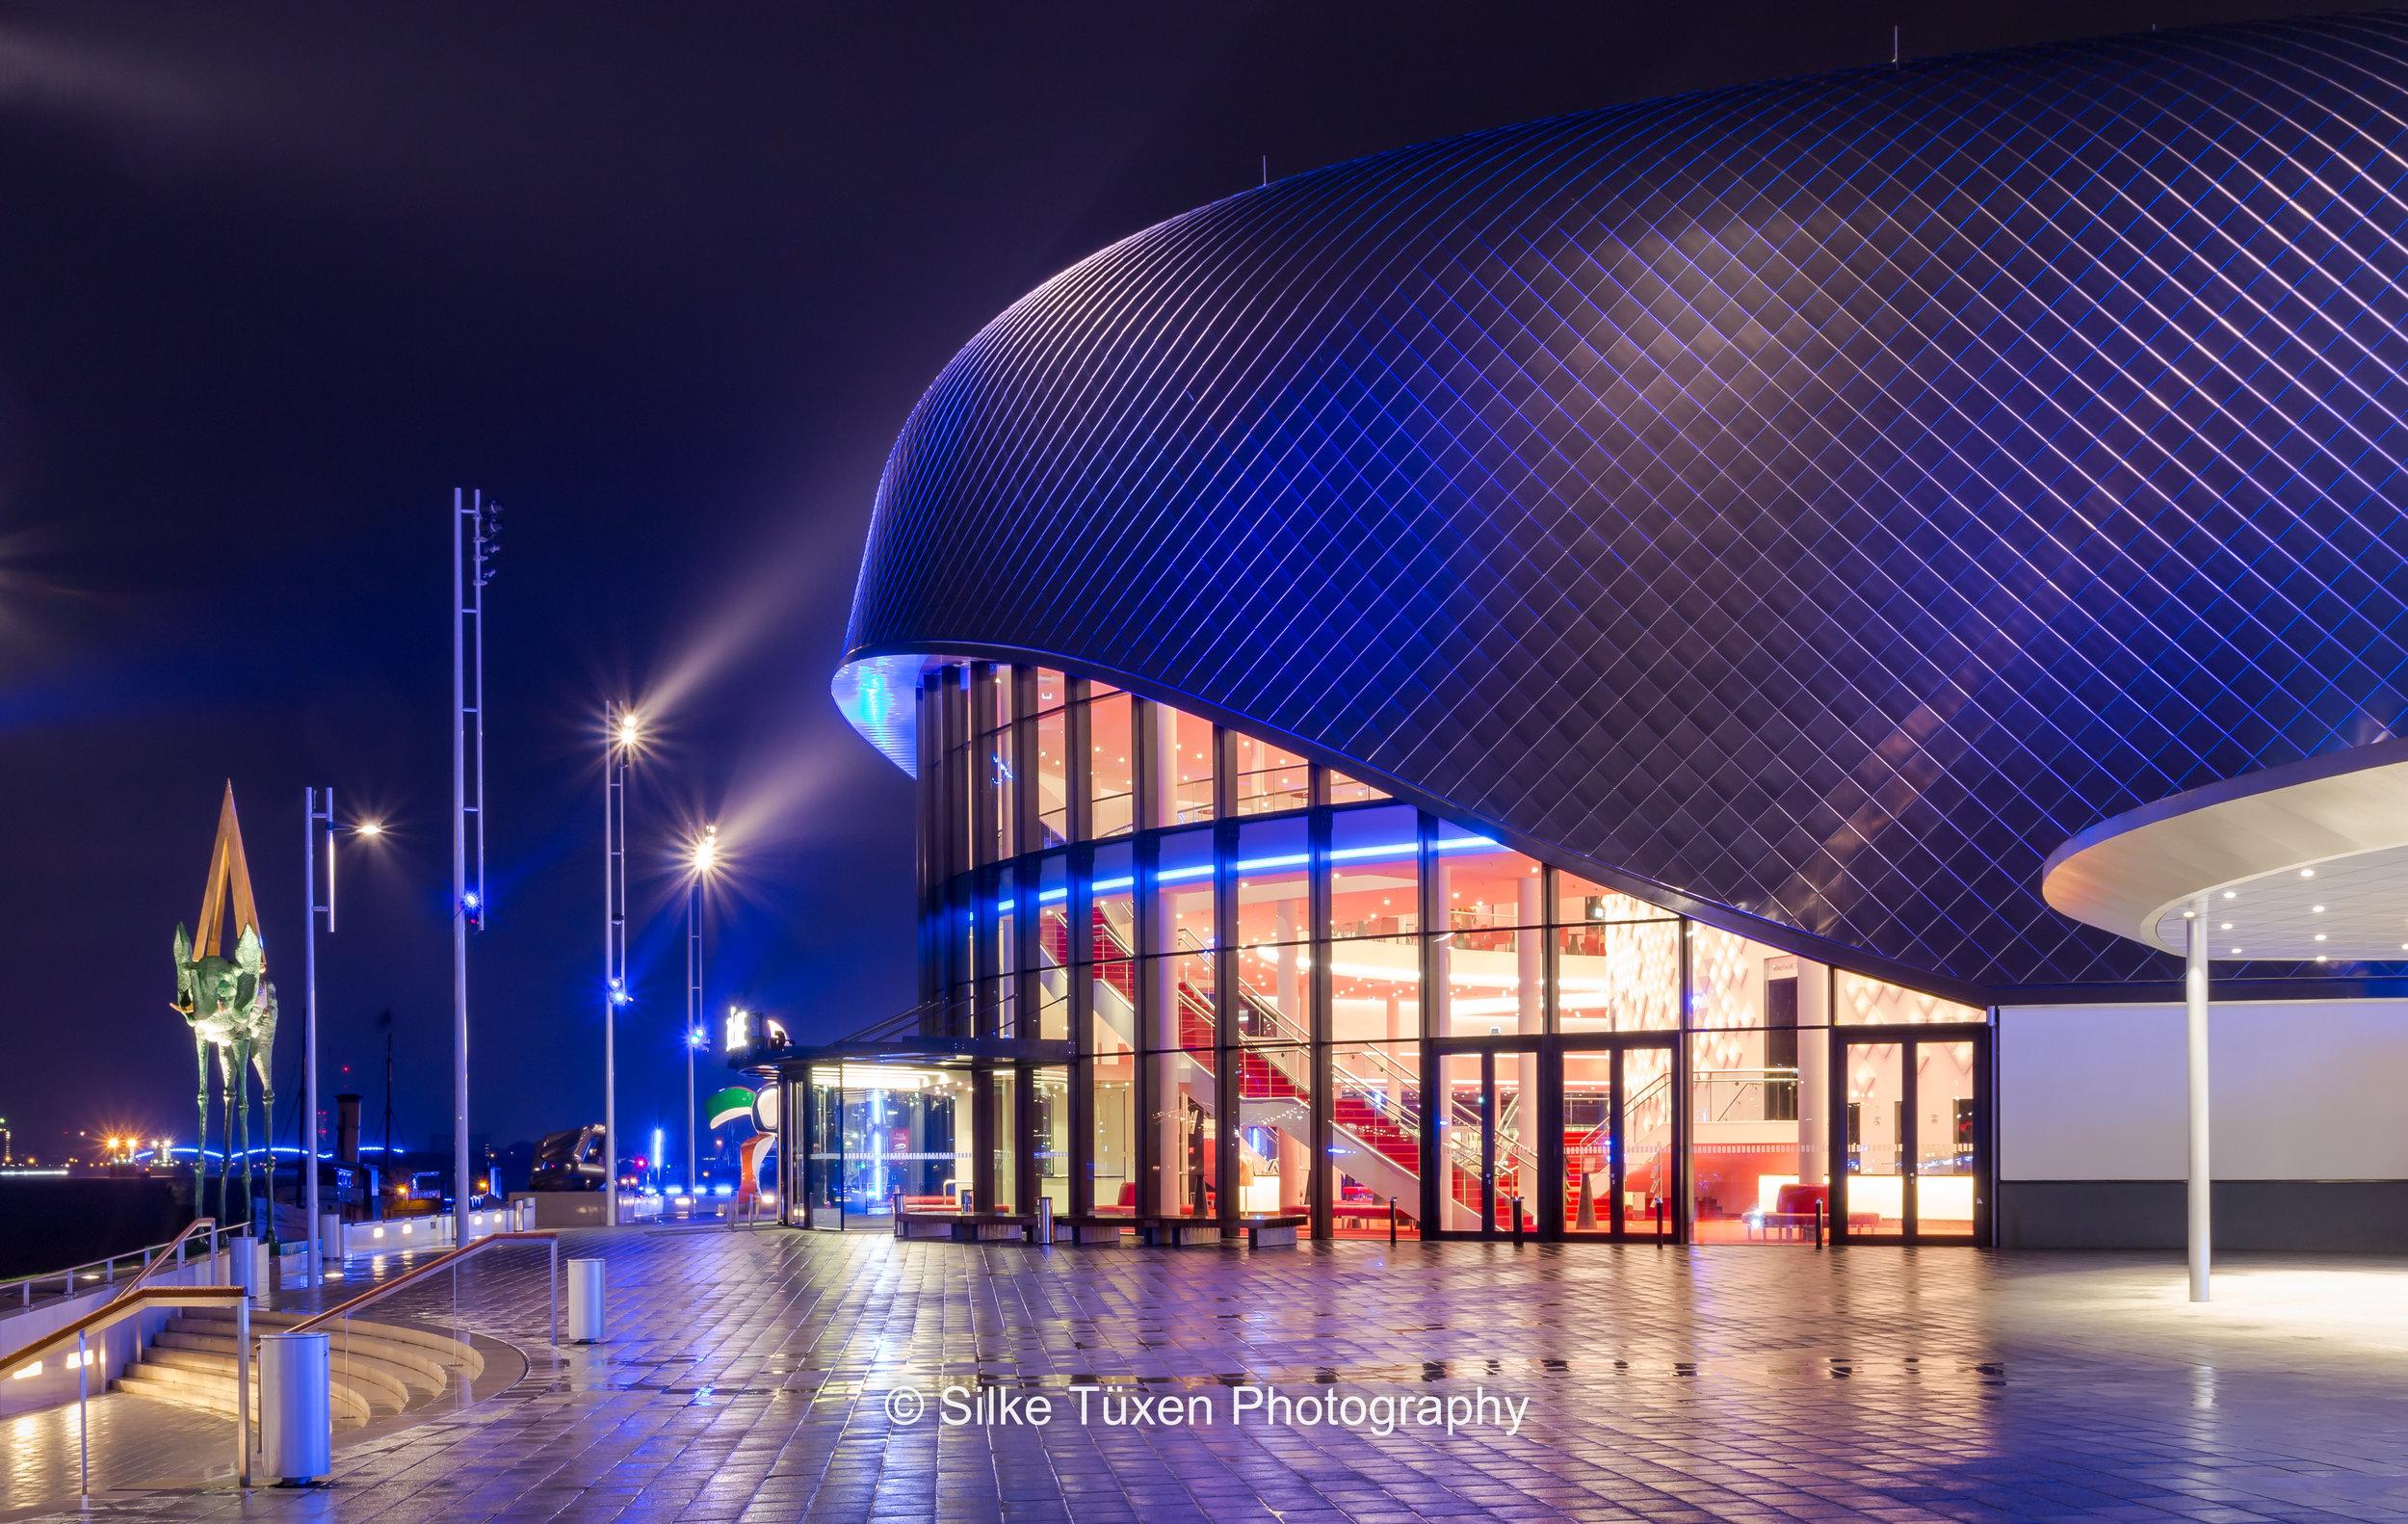 Stage Theatre - Stage Theater, Hamburg